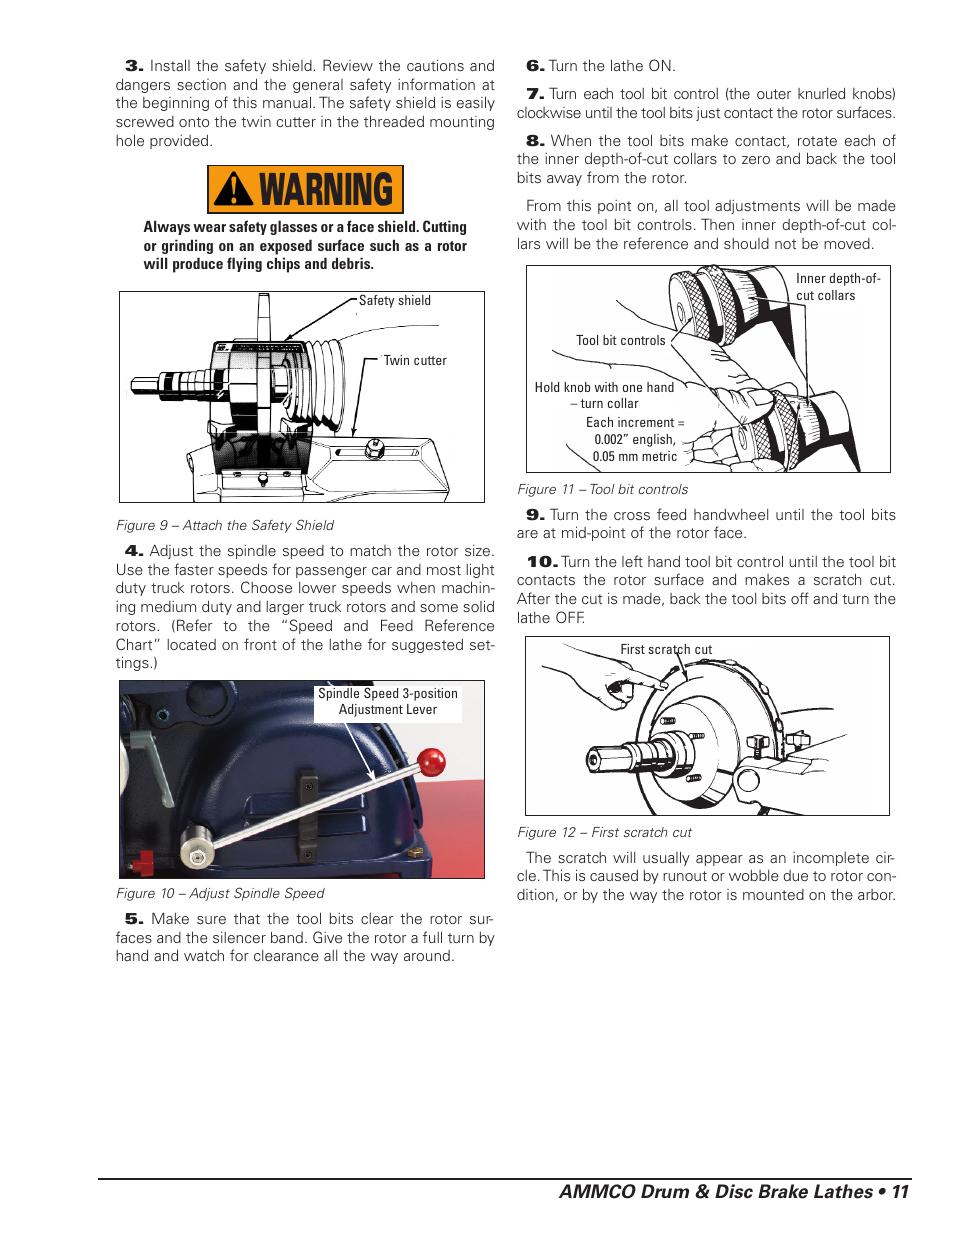 Warning, Ammco drum & disc brake lathes • 11 | AMMCO 4000E